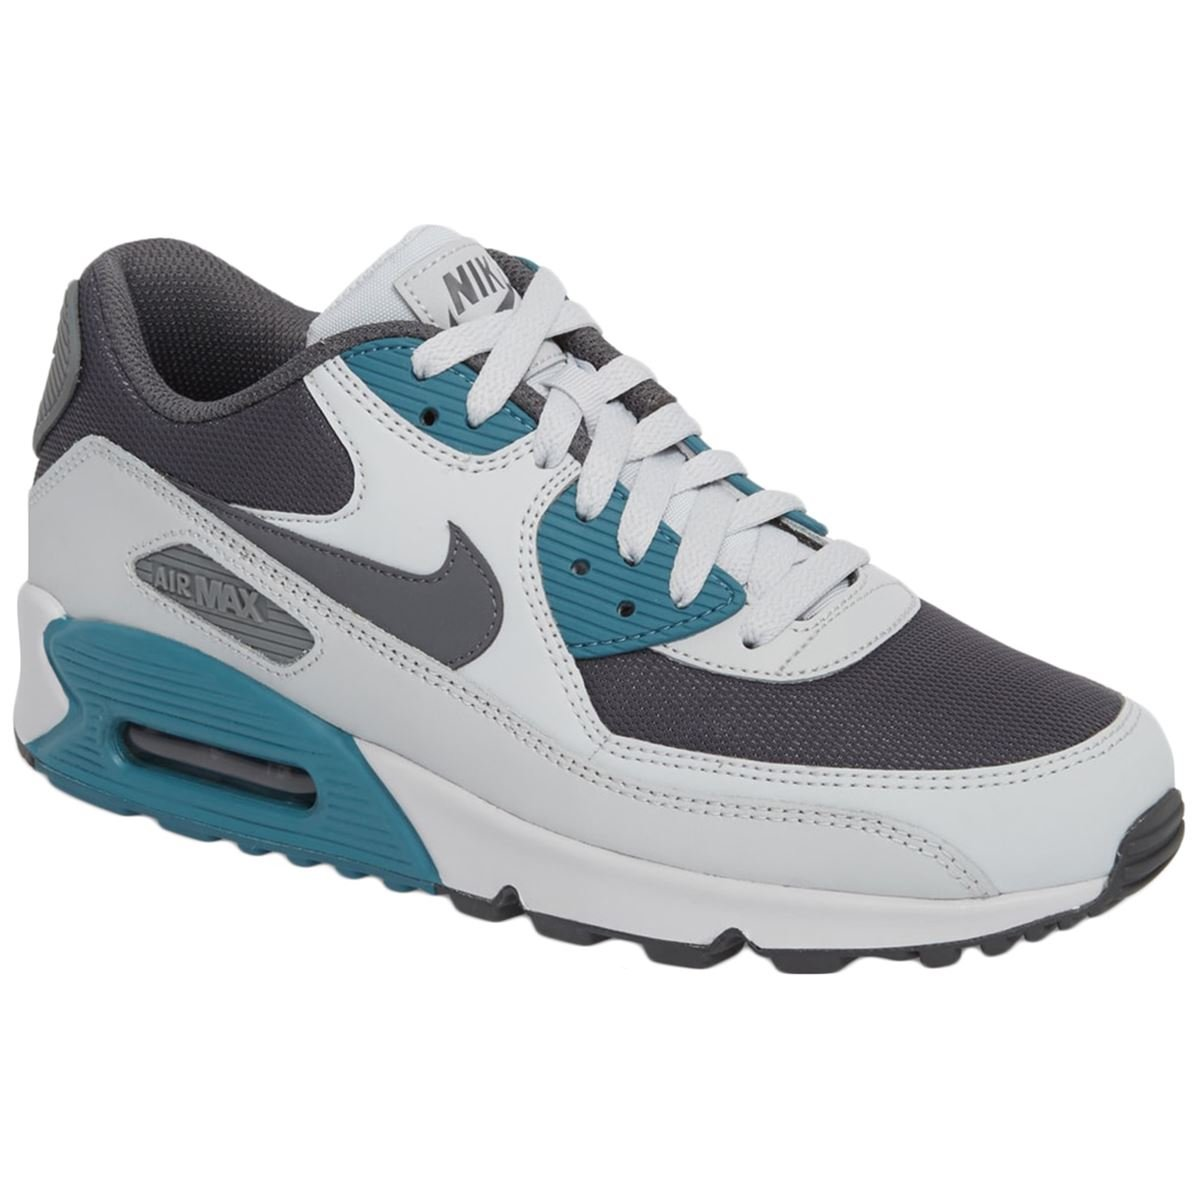 NIKE AIR MAX 90 Essential Running Shoes Noise Aqua Gray 537384 086 Men's NEW